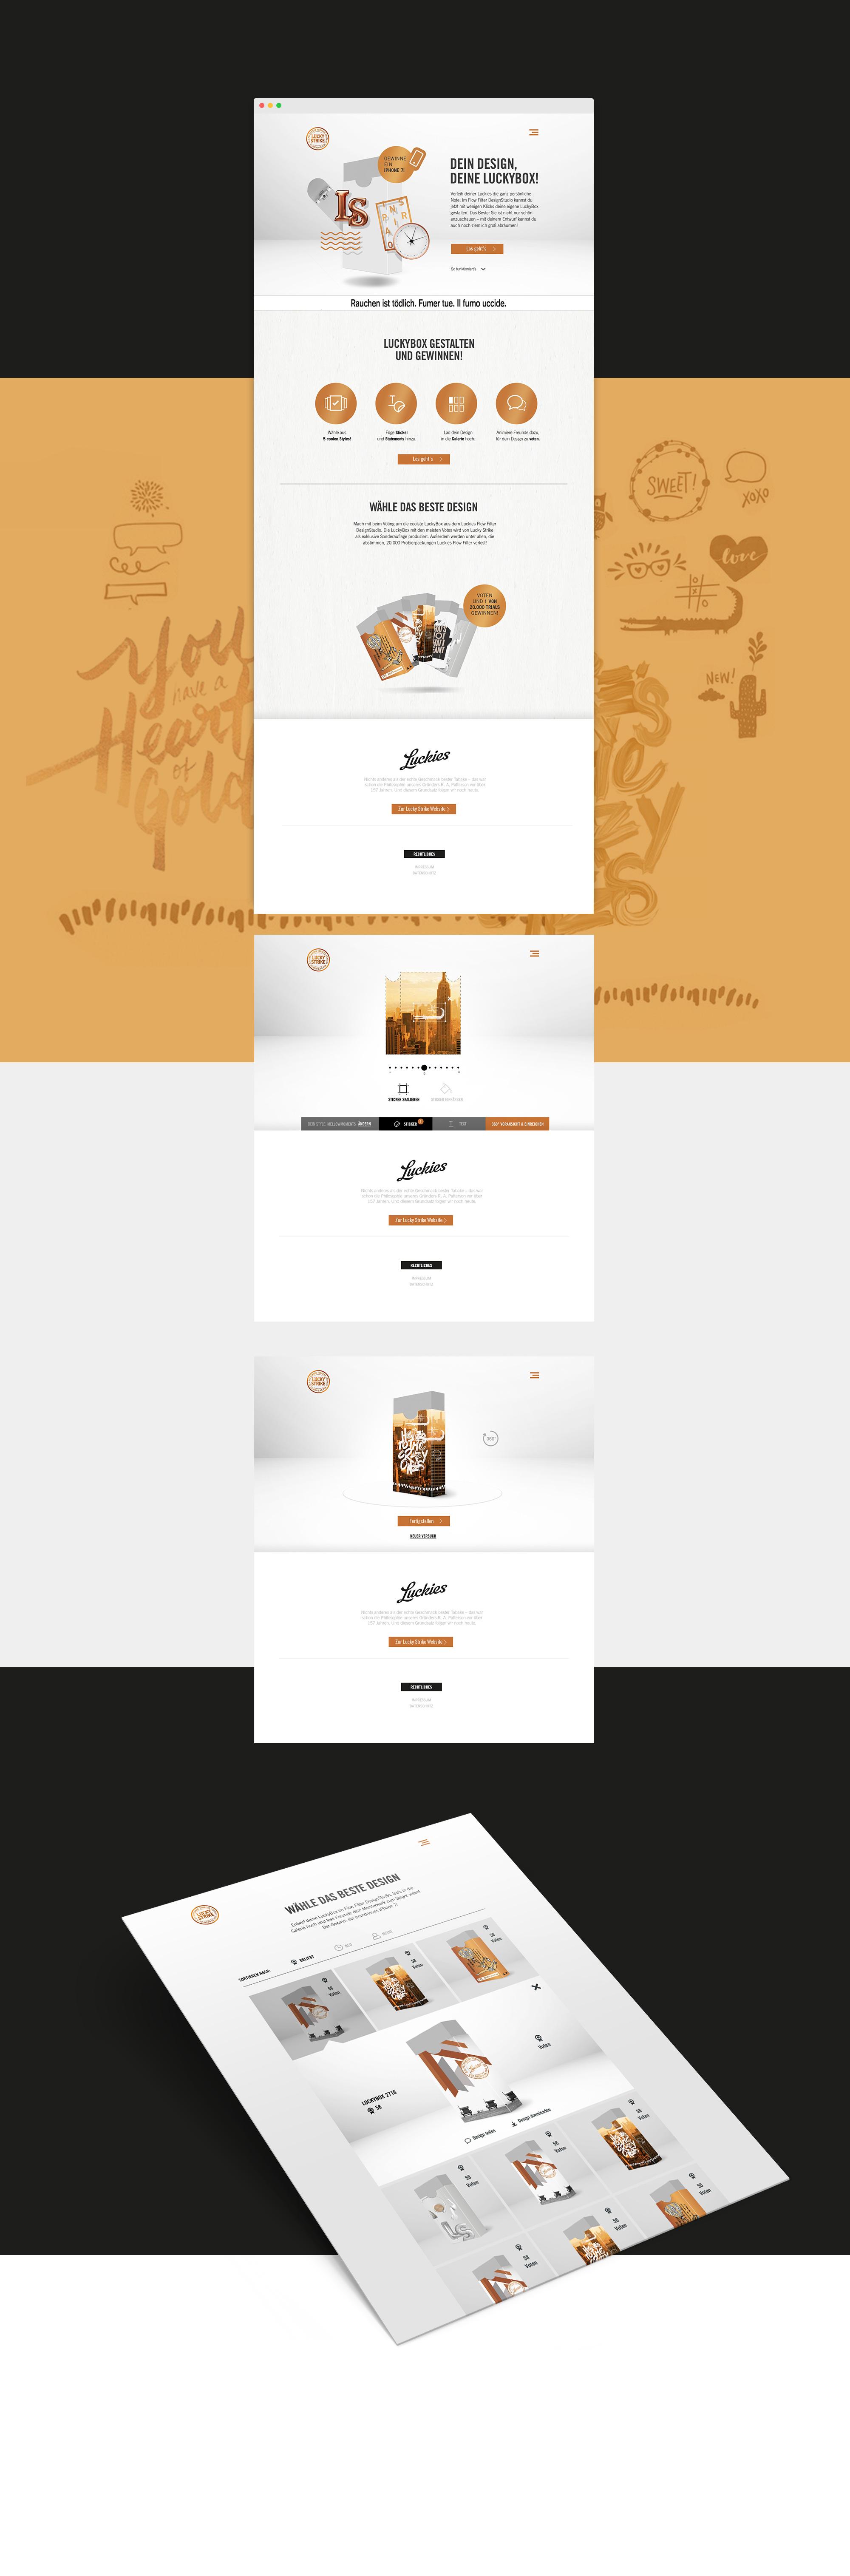 layouts_01